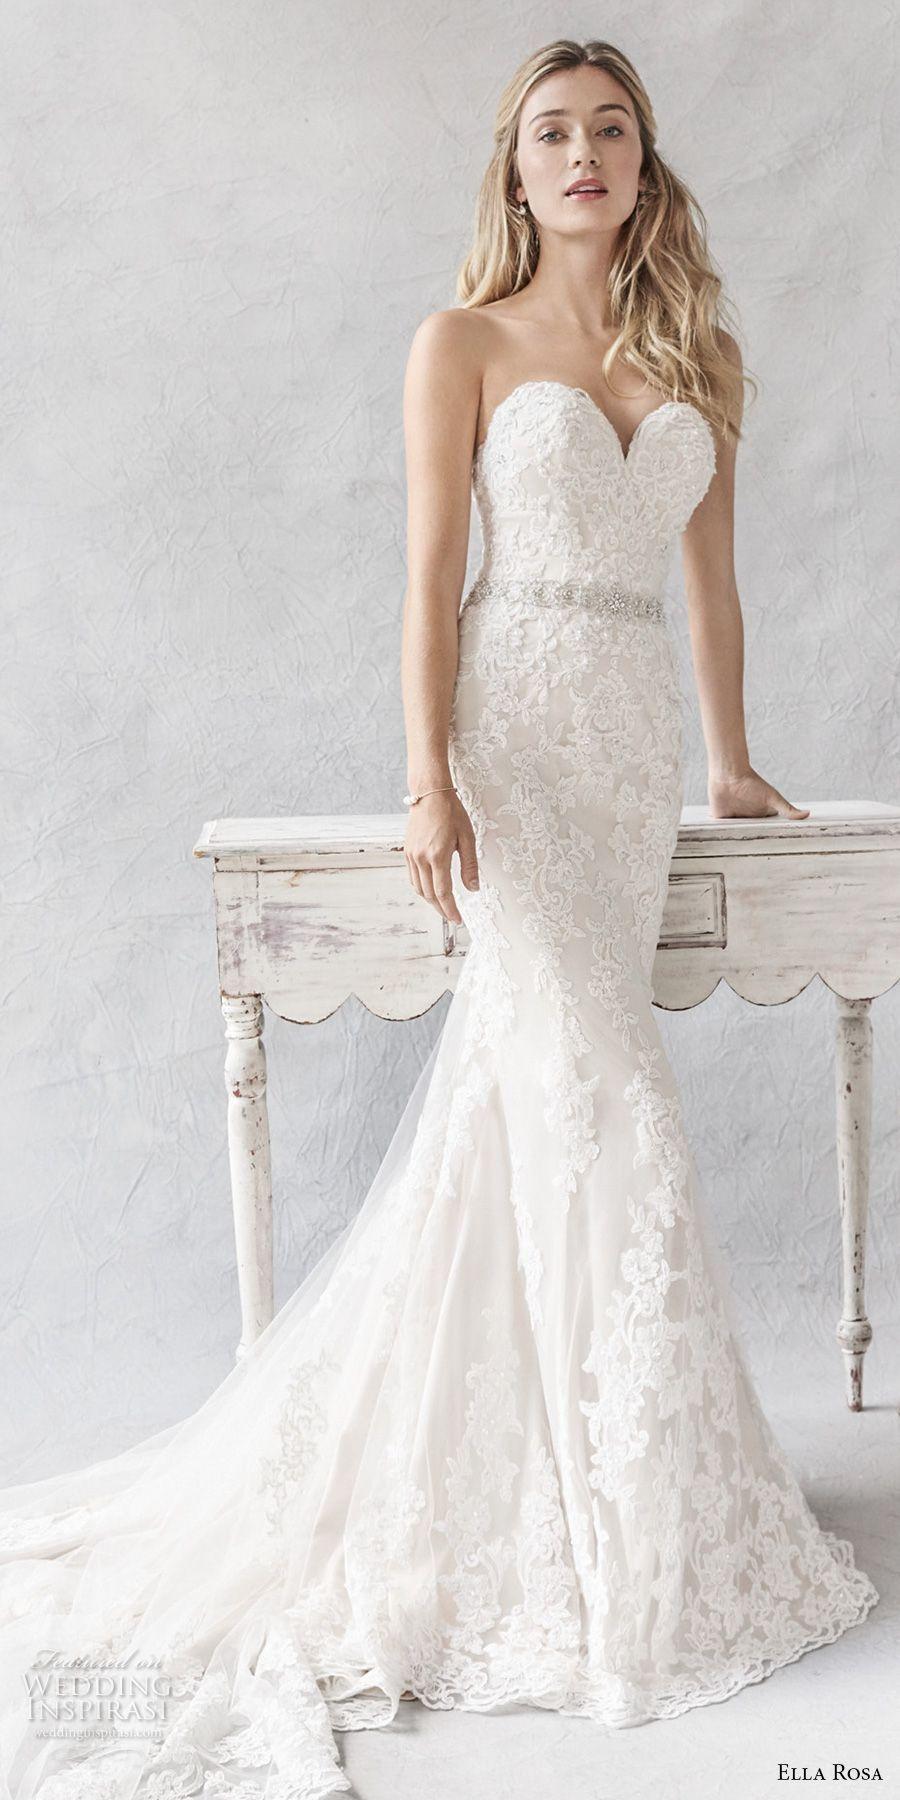 Ella Rosa Spring 2017 Bridal Strapless Sweetheart Neckline Full Embellishment Elegant Sheath Fit Flare Wedding Dress Chapel Train 377 Mv